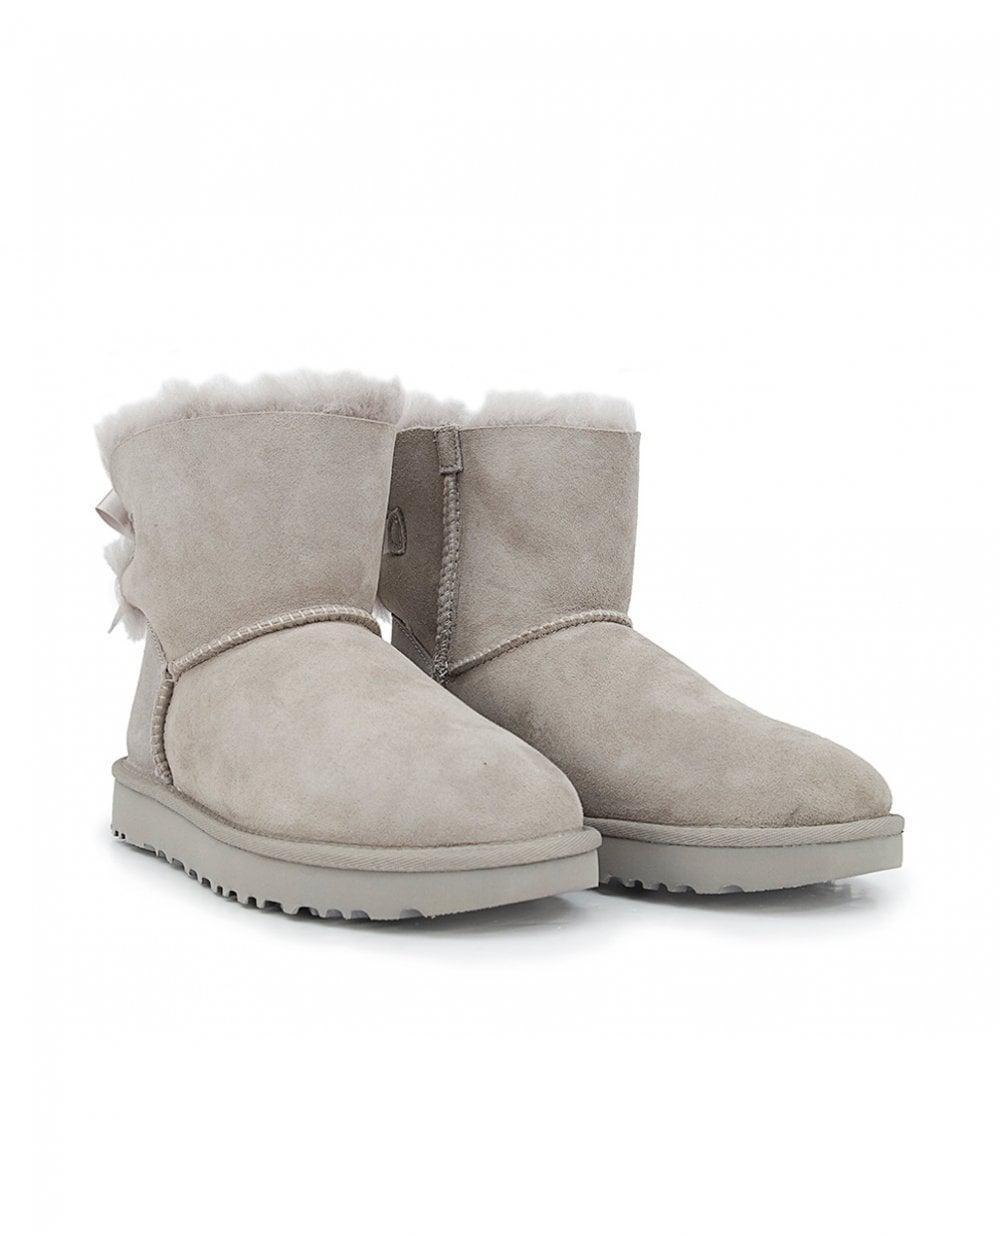 be3606fe75c Ugg - Gray Mini Bailey Bow Ii Classic Boots - Lyst. View fullscreen